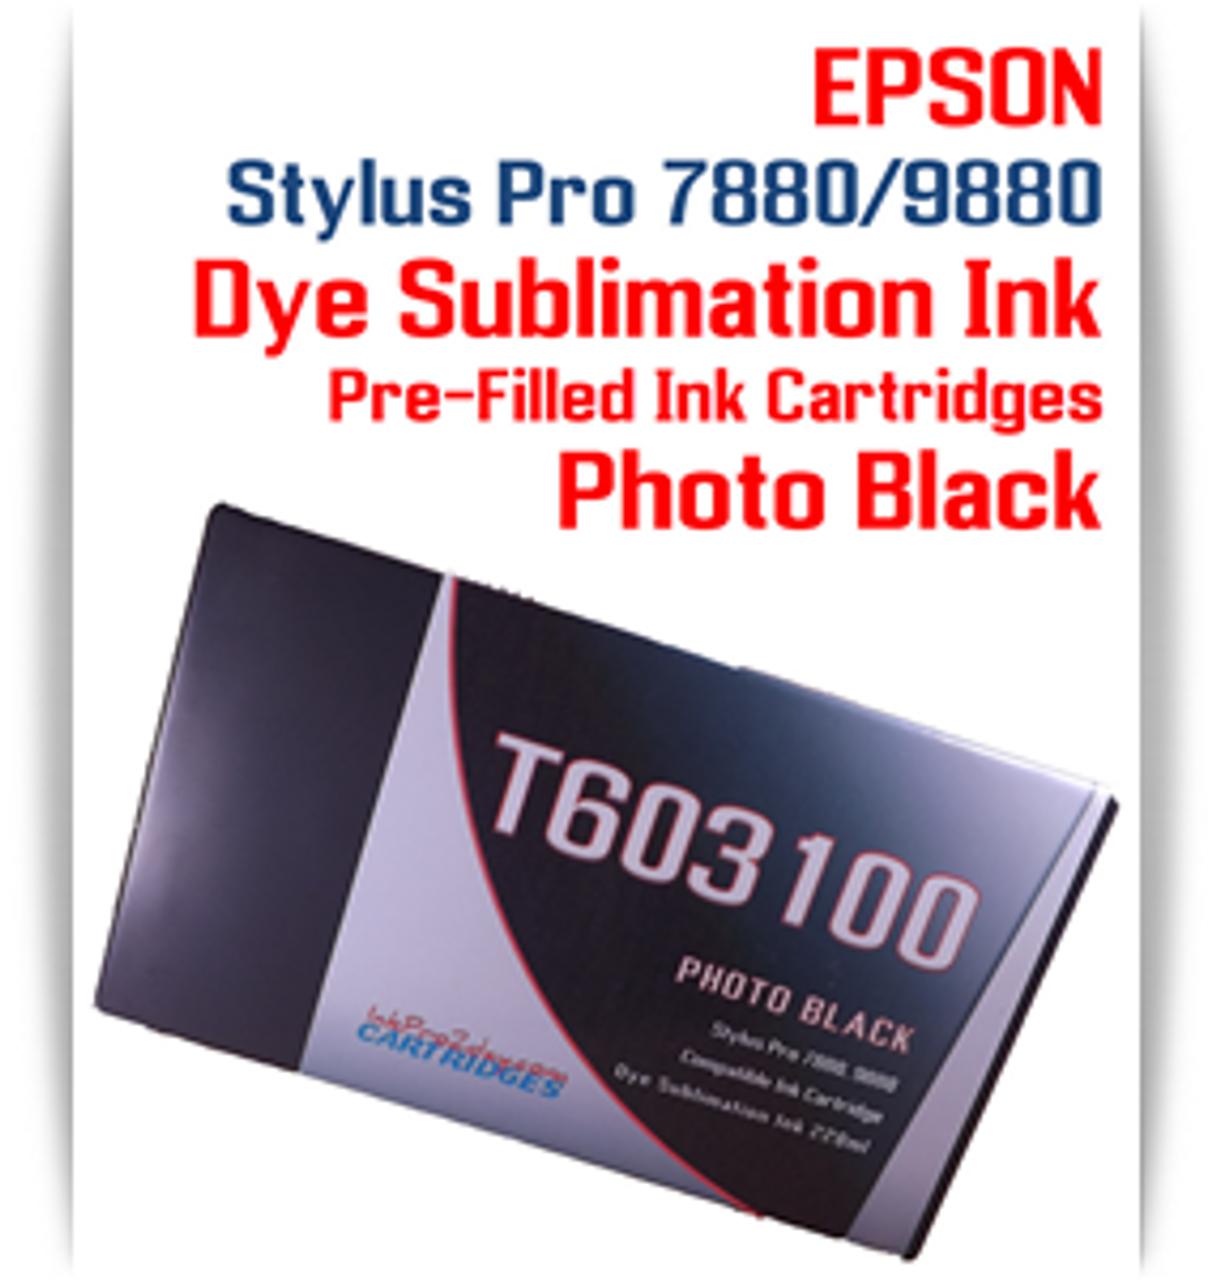 Photo Black Epson Stylus Pro 7880/9880 Pre-Filled with Dye Sublimation Ink Cartridge 220ml